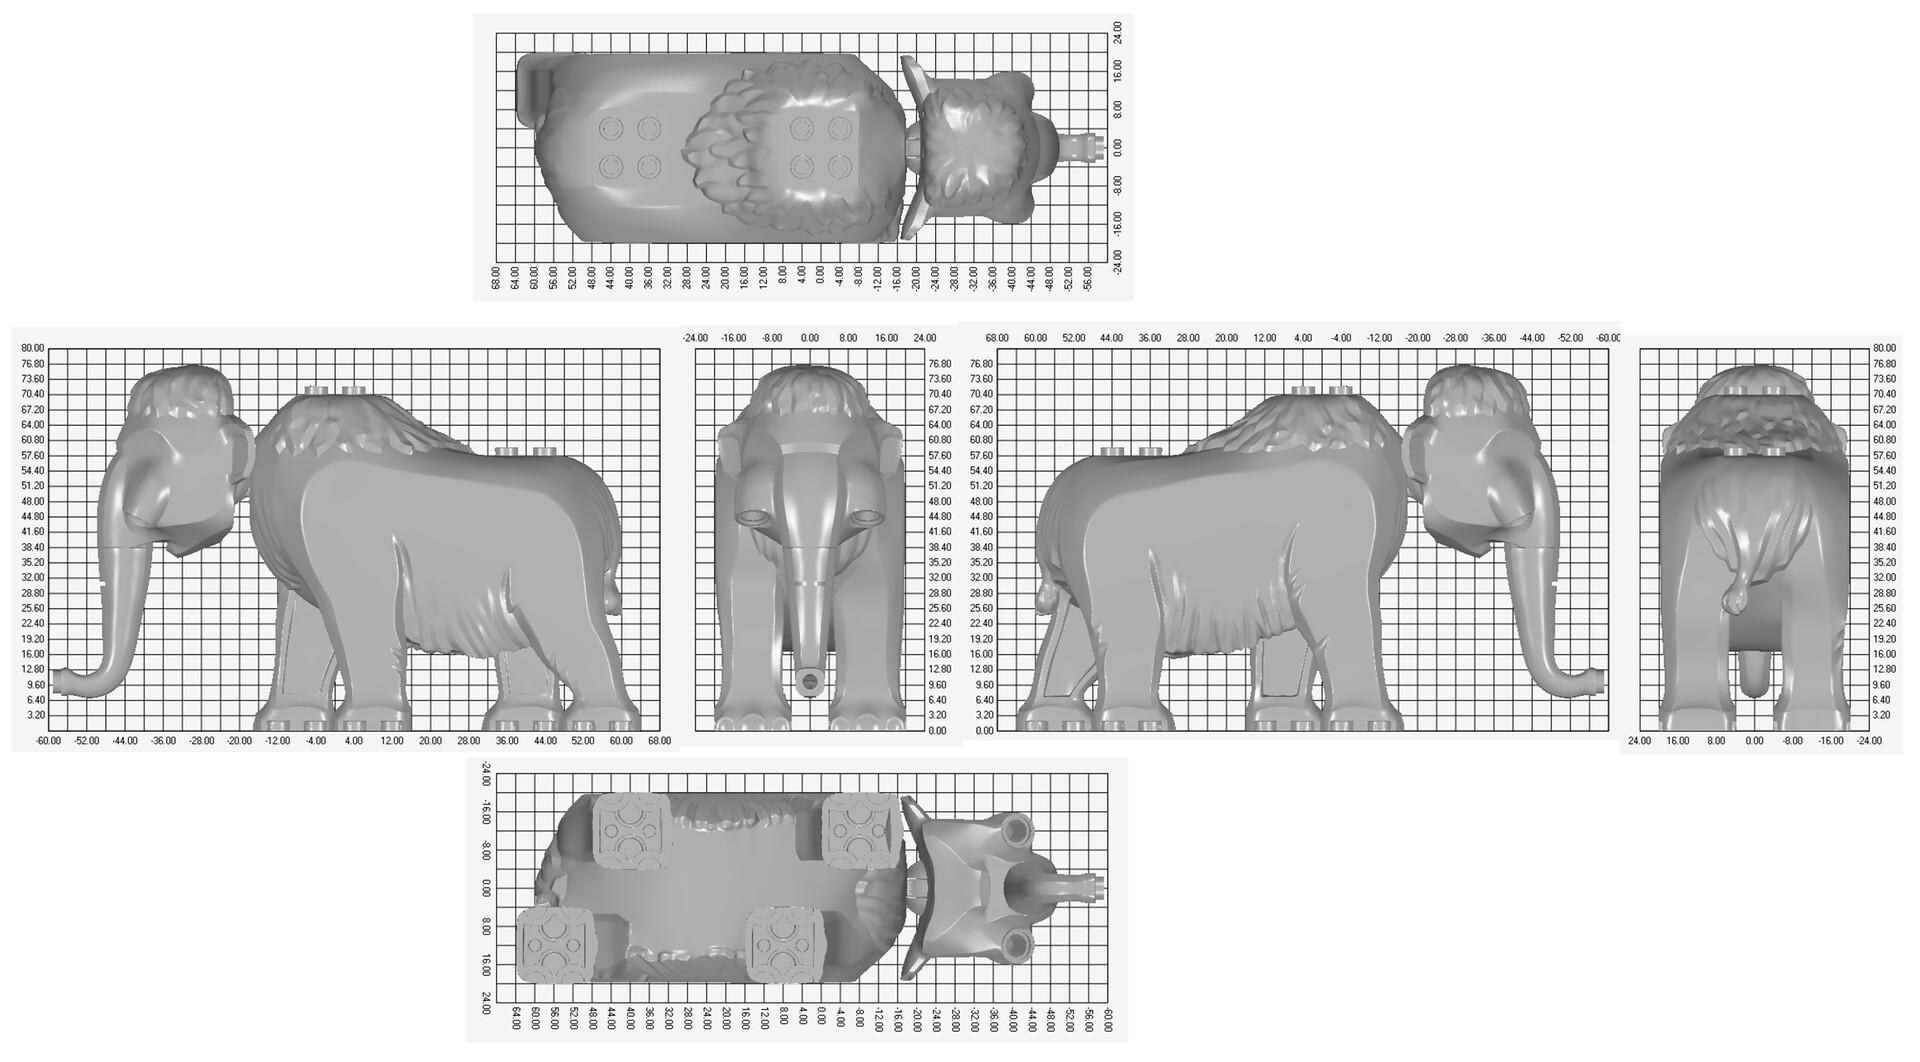 Paul marion wood mammoth body full grid